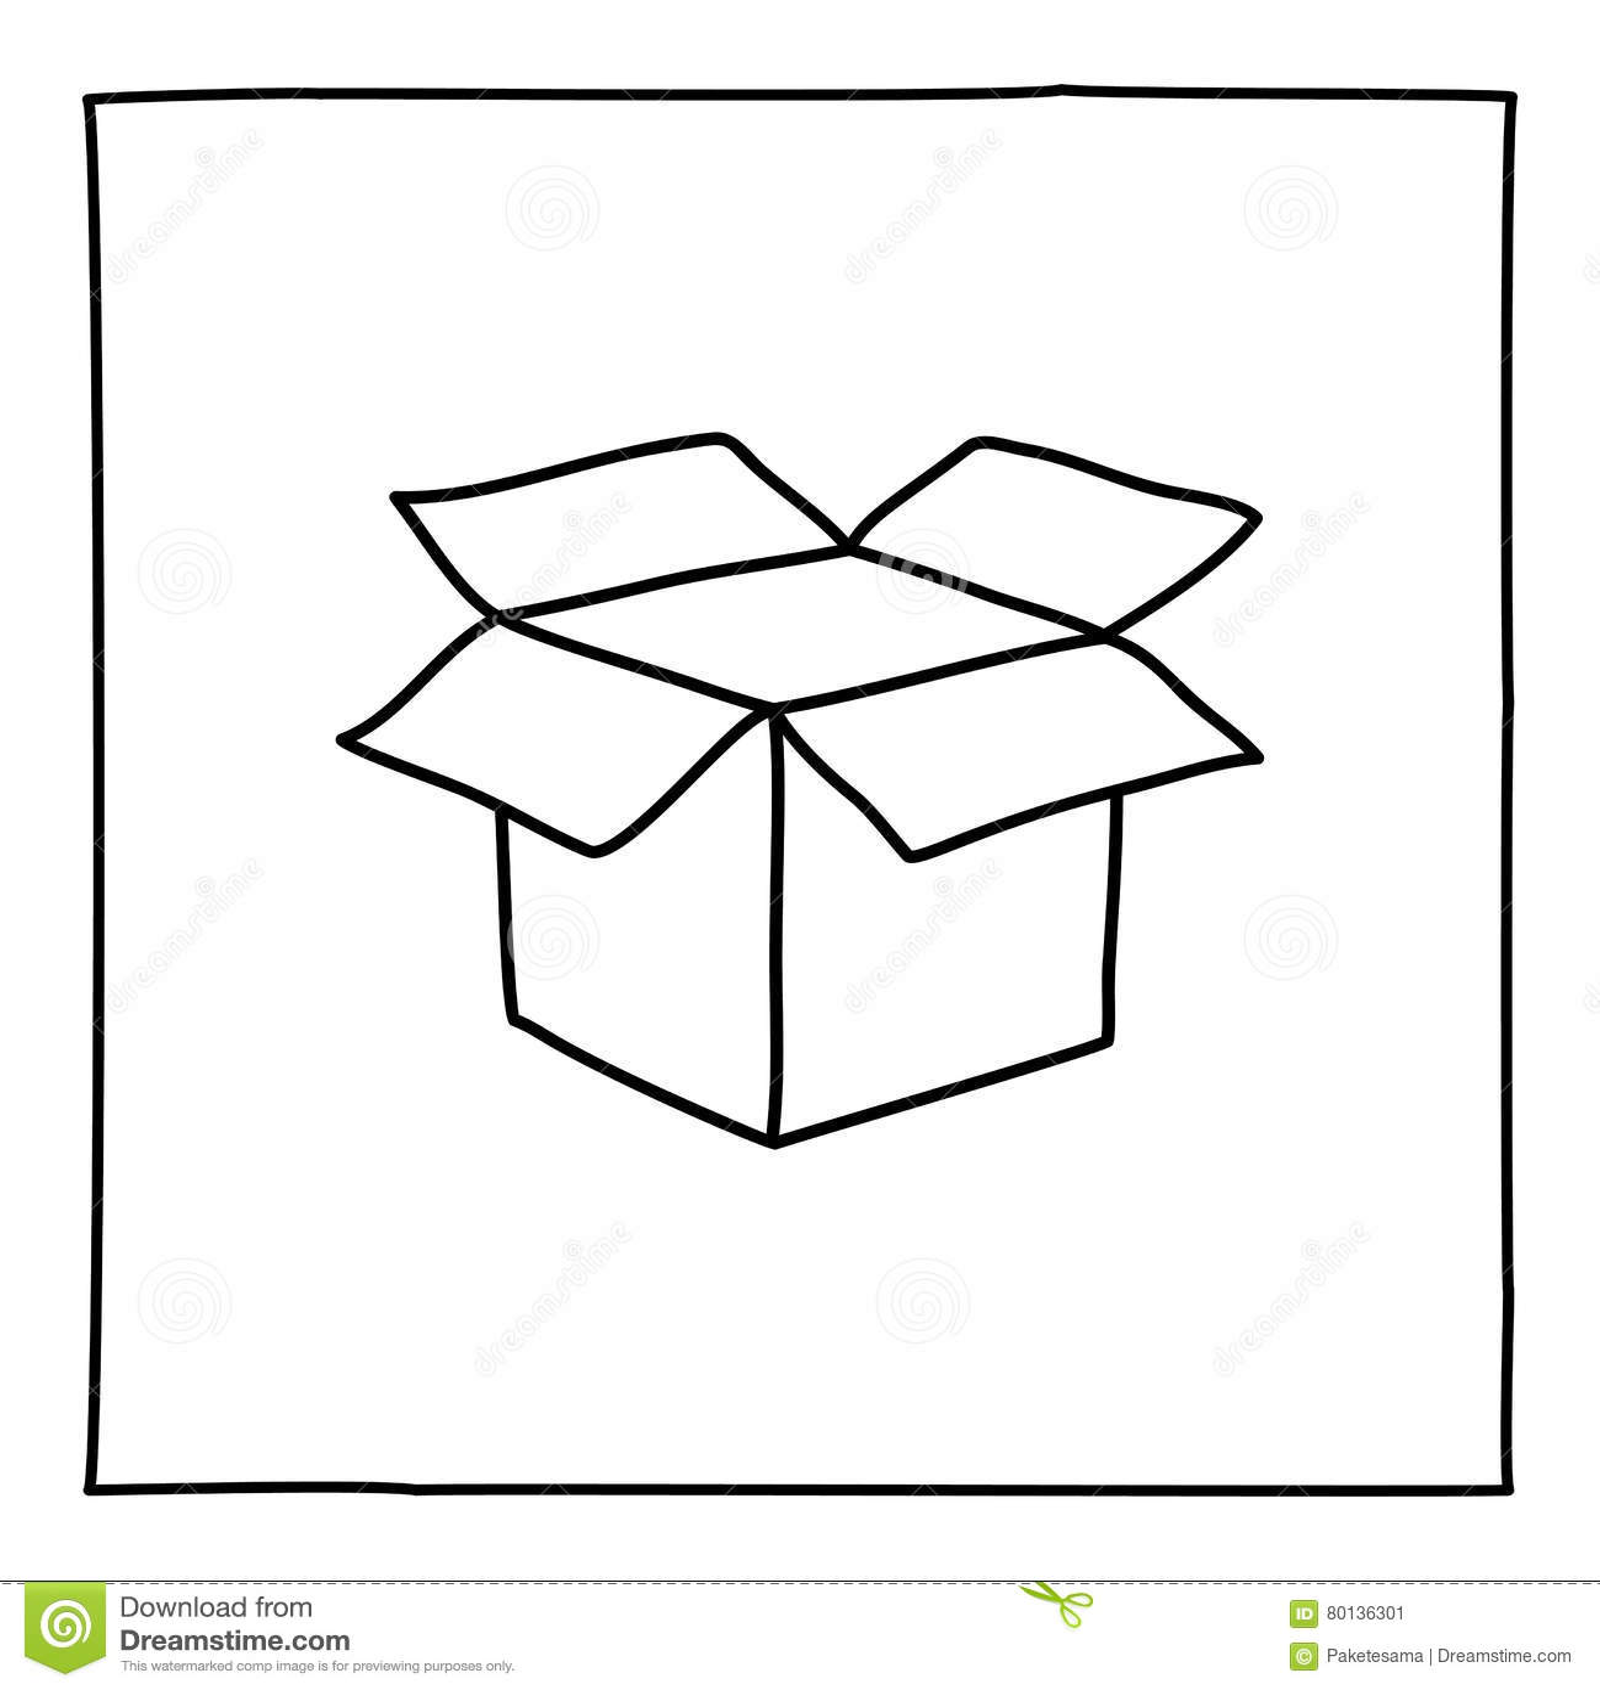 Doodle open box icon stock illustration. Illustration of draw - 80136301